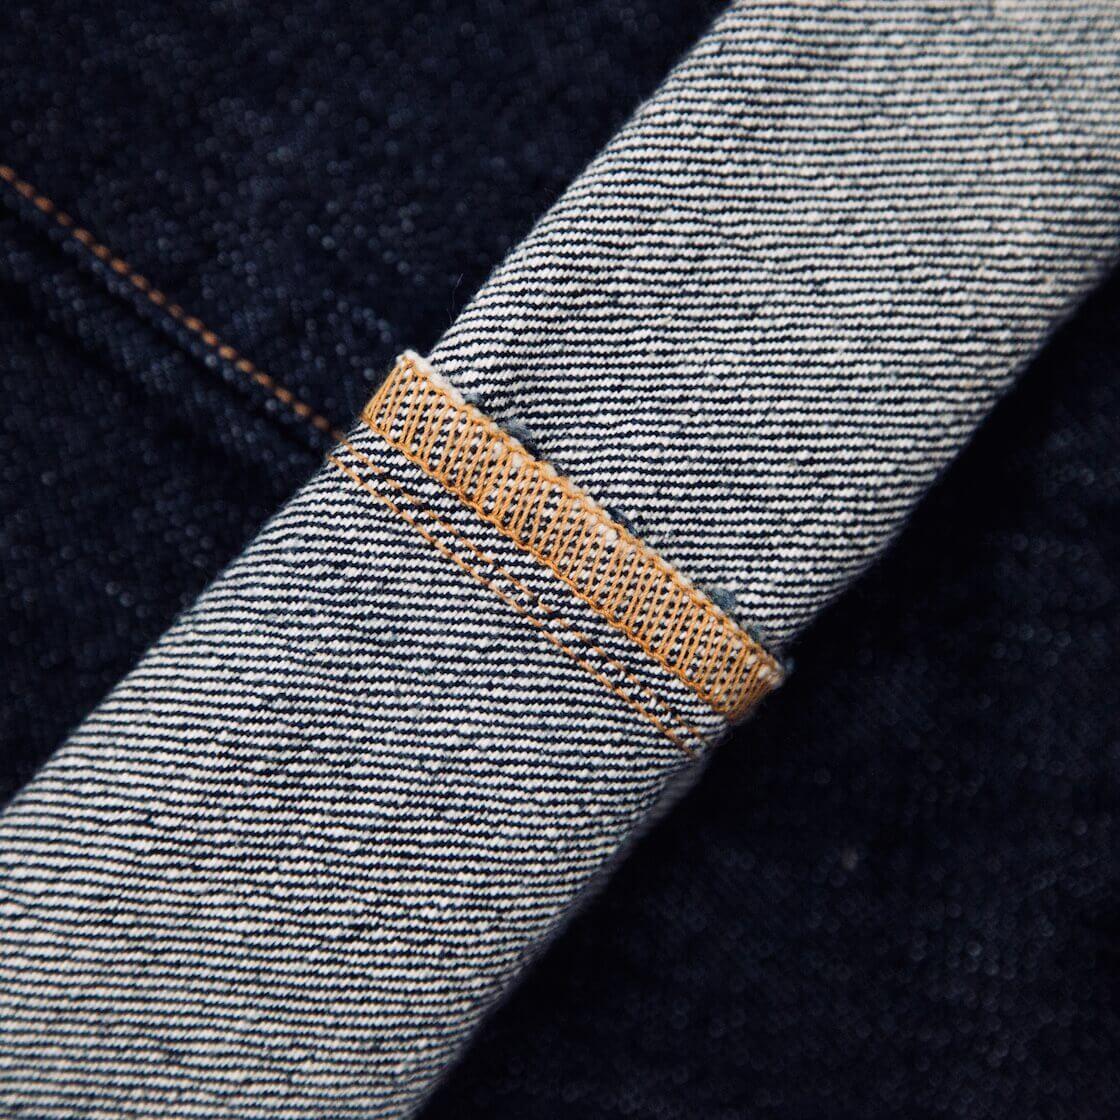 detail image of lockstitch on denim jeans